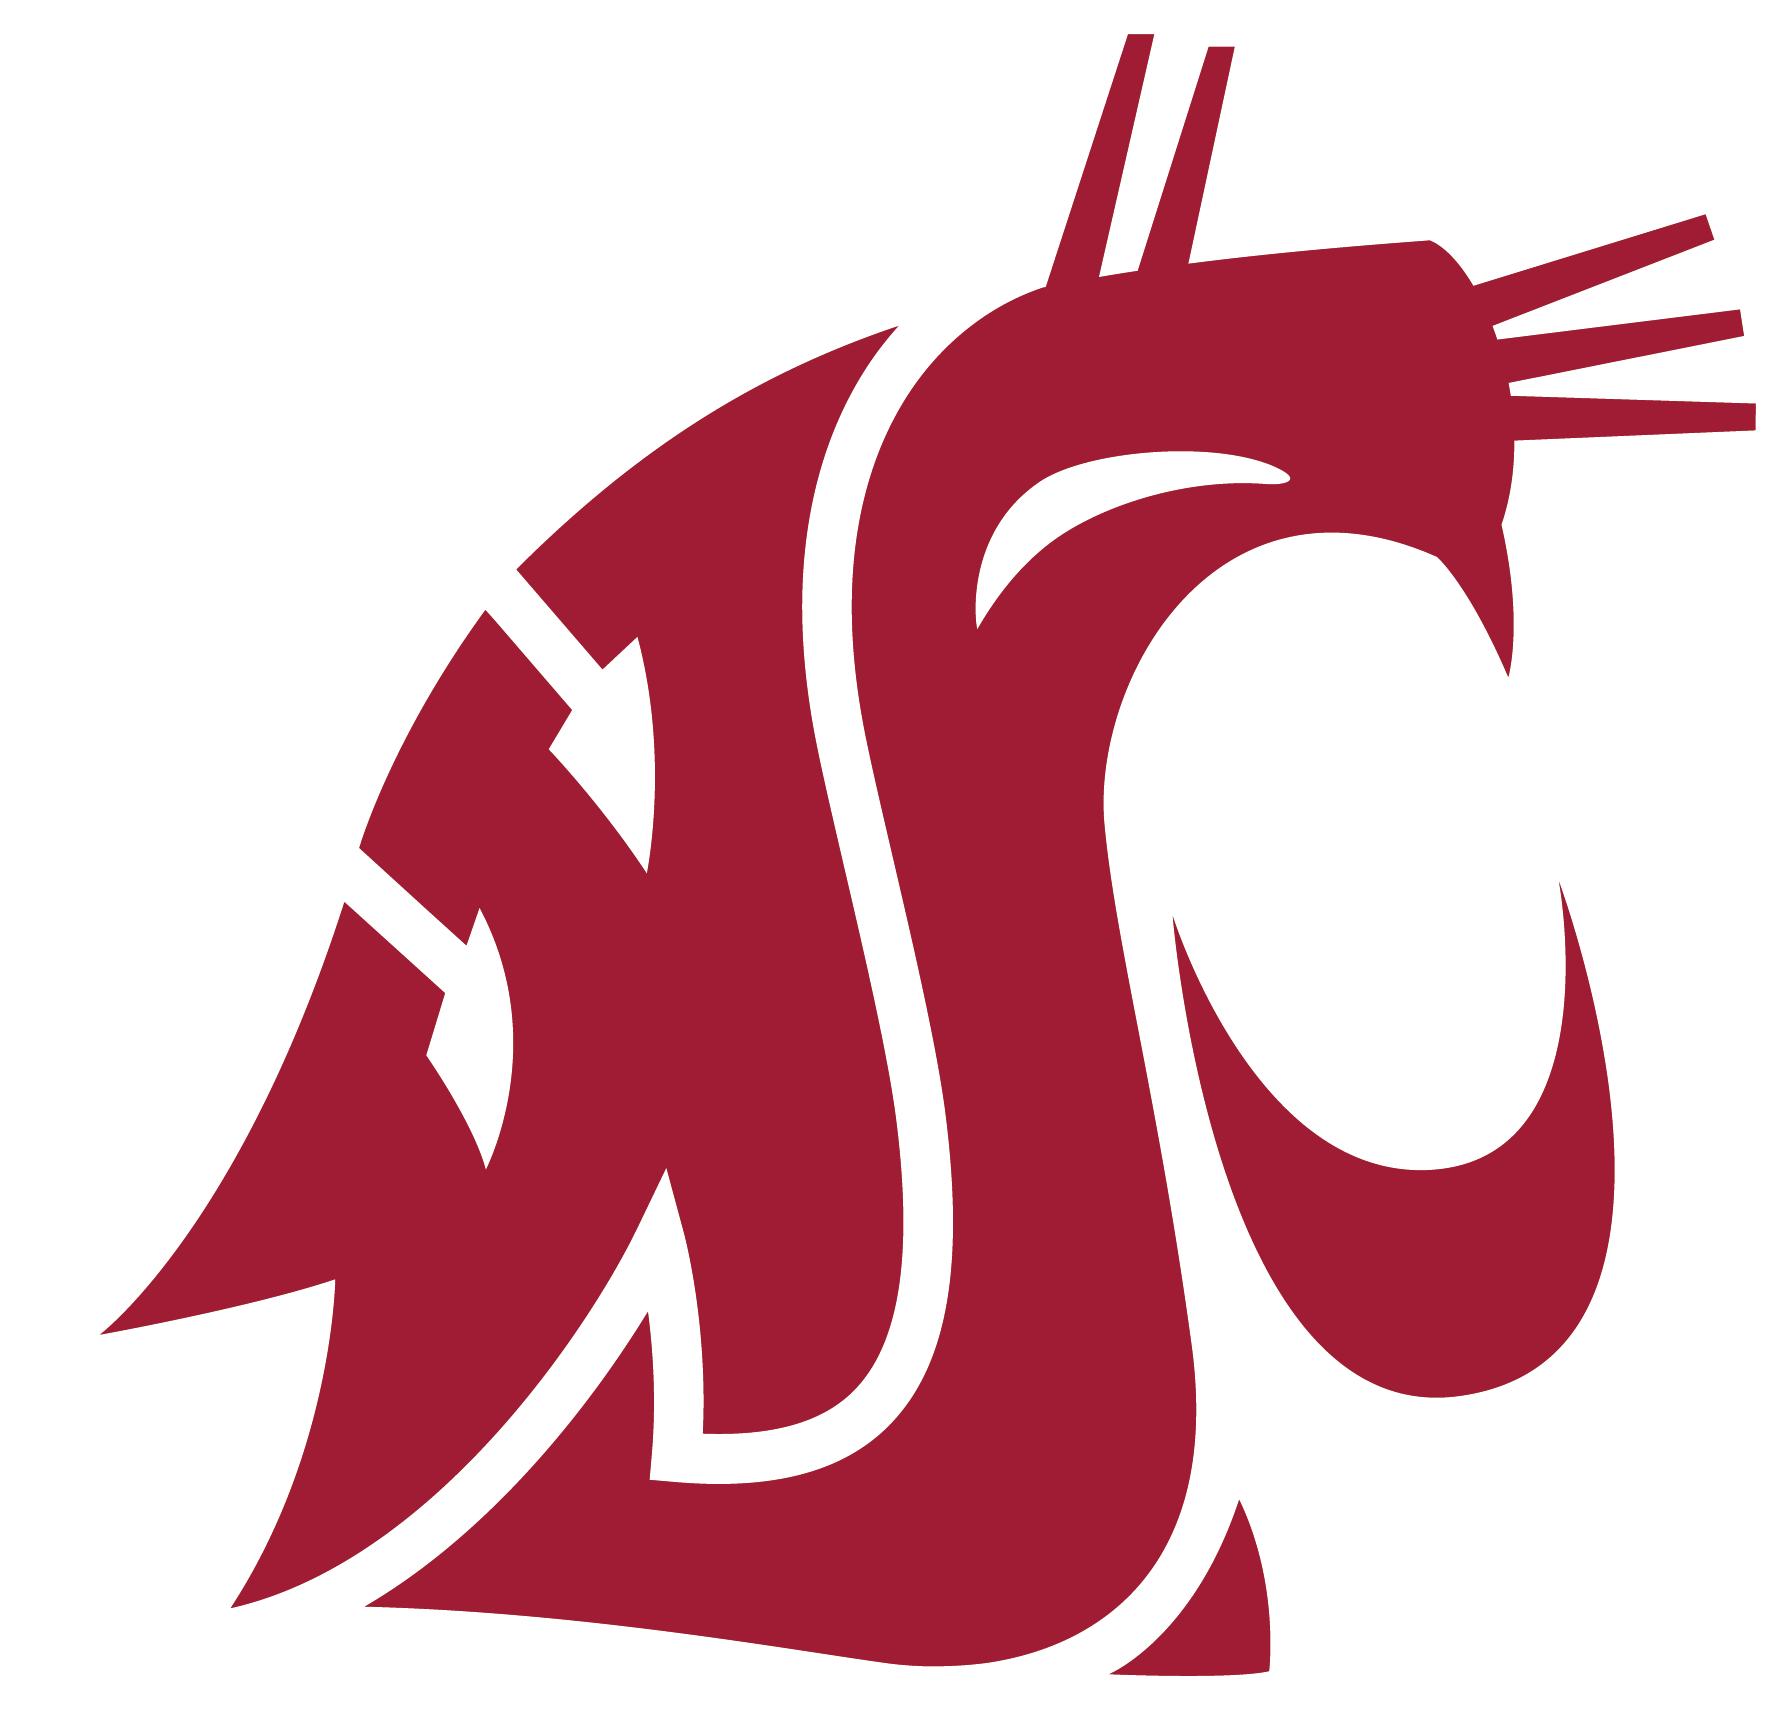 Cougar clipart logo. Logos and templates sport